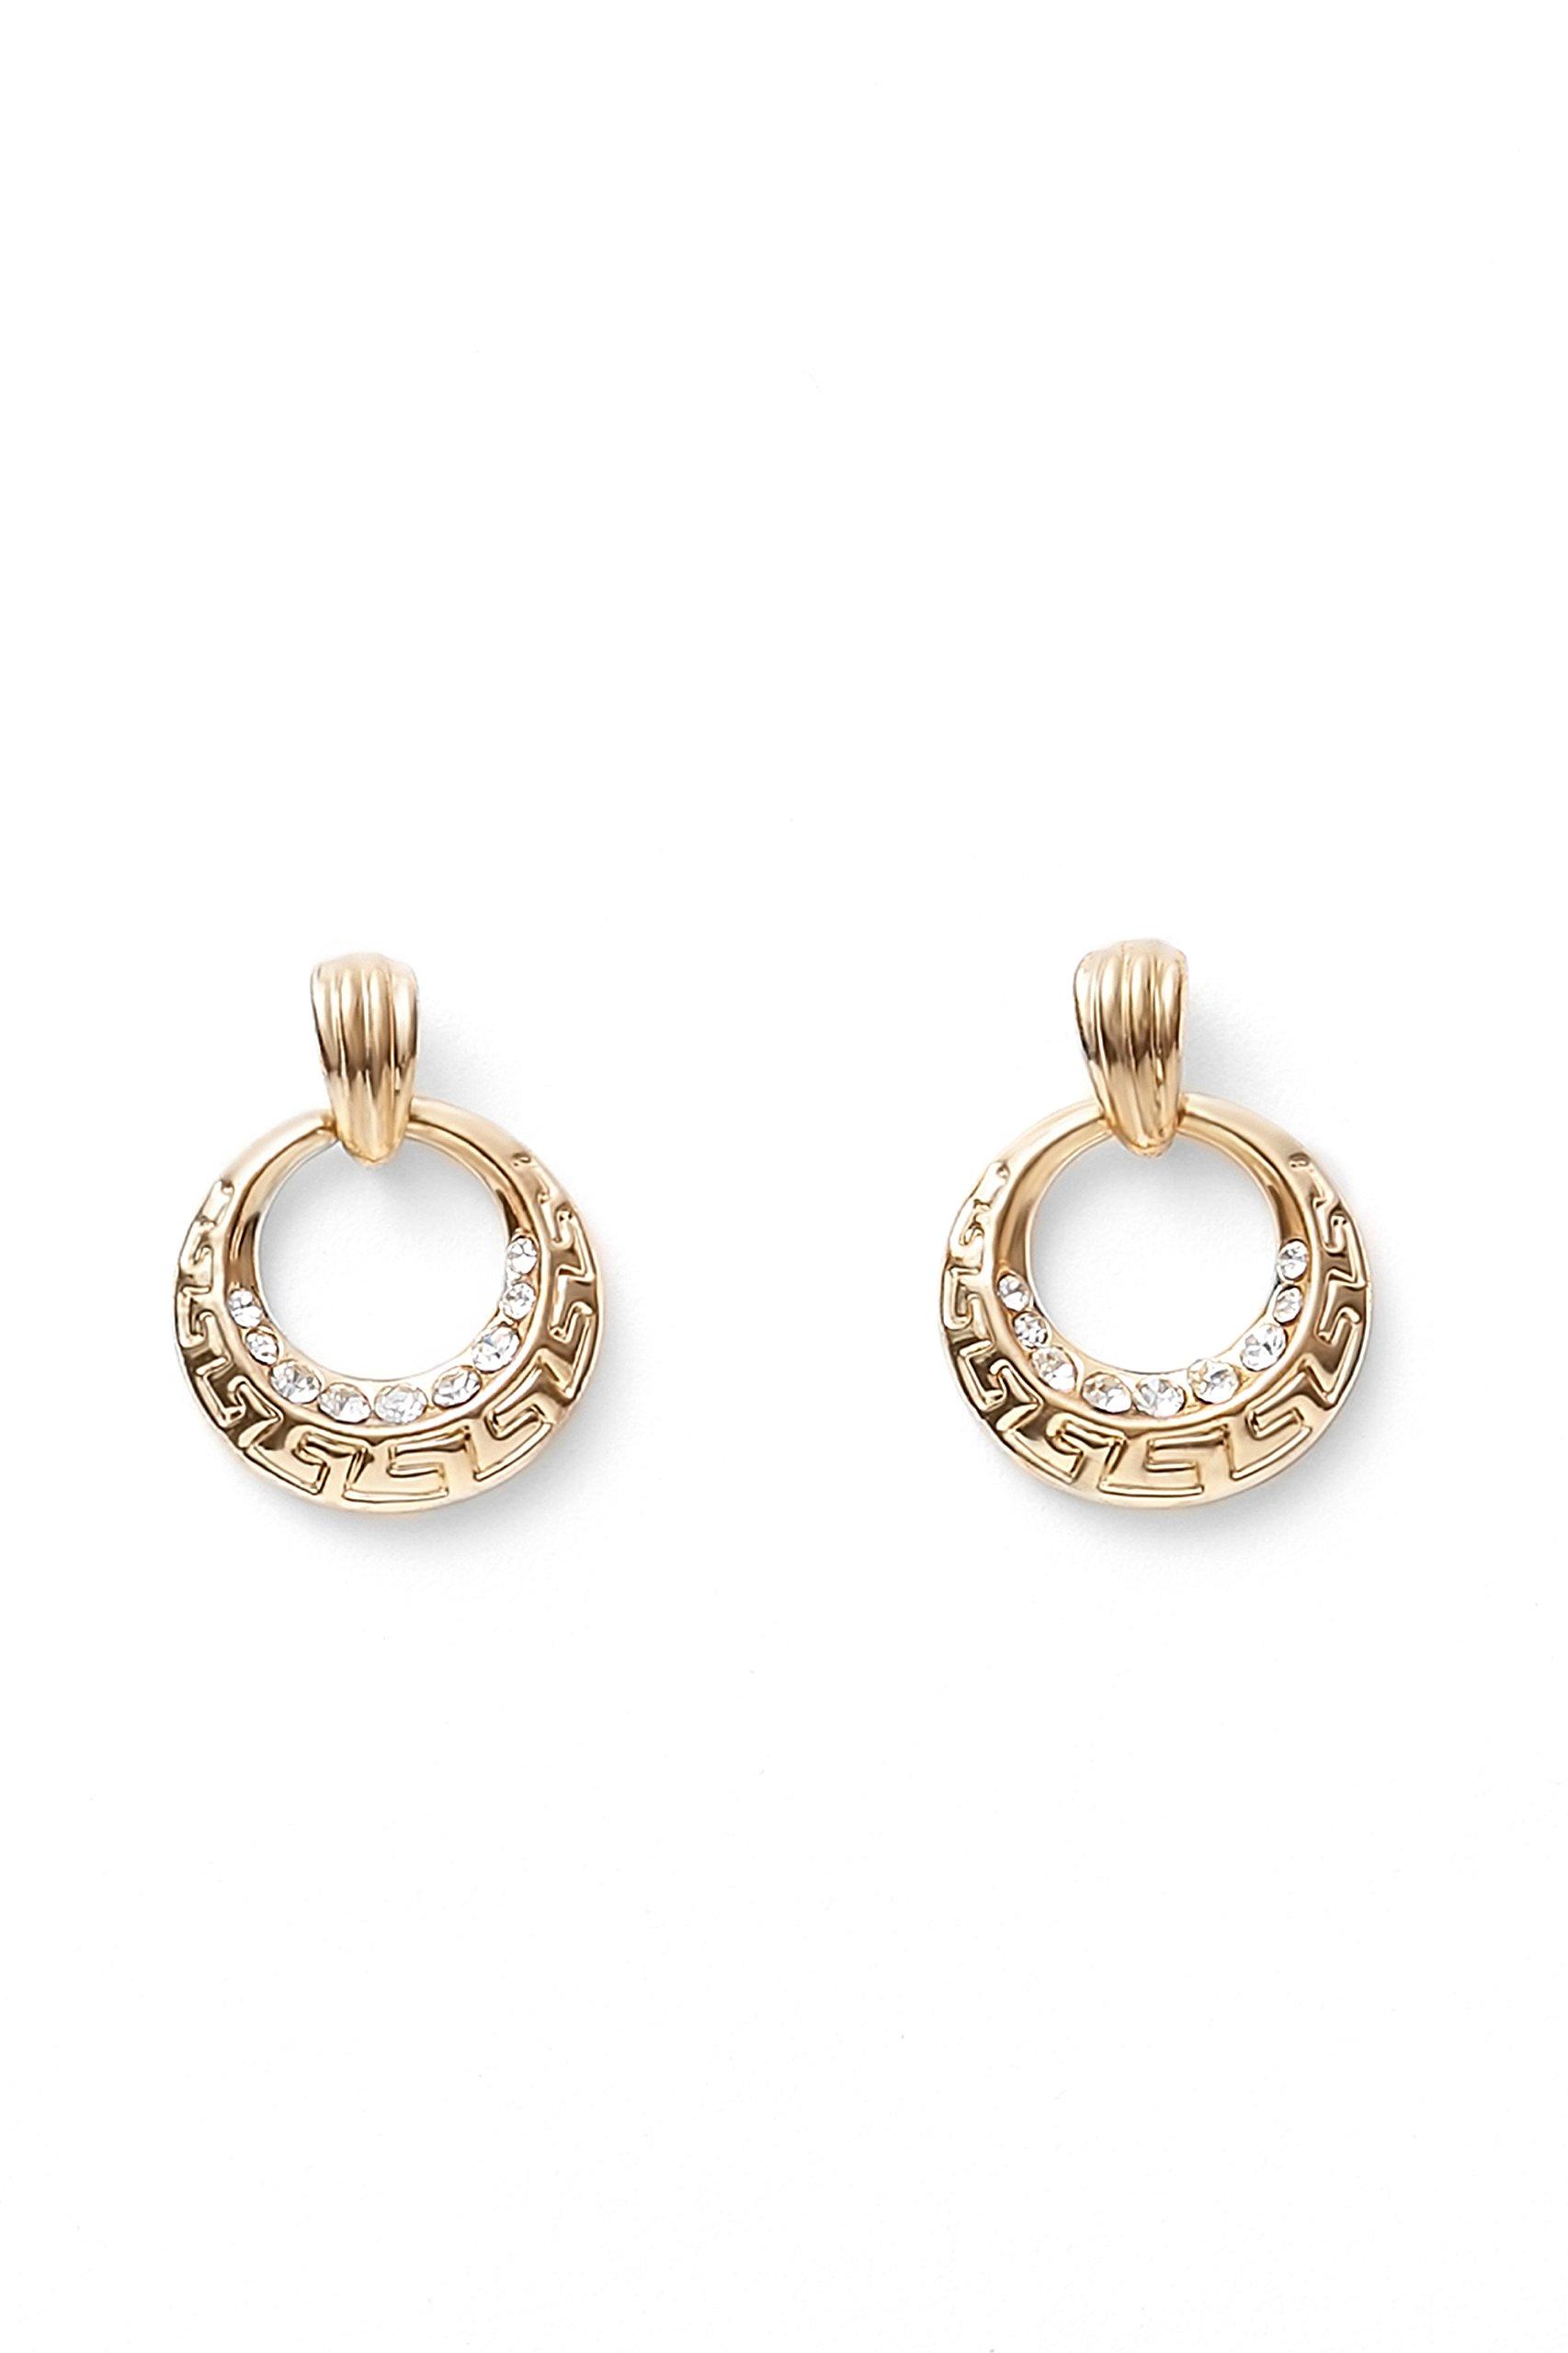 Open Circle Drop Earrings Posts Greek Key Hoops Dangle Earring Set Dangling Studs (gold, open circle)